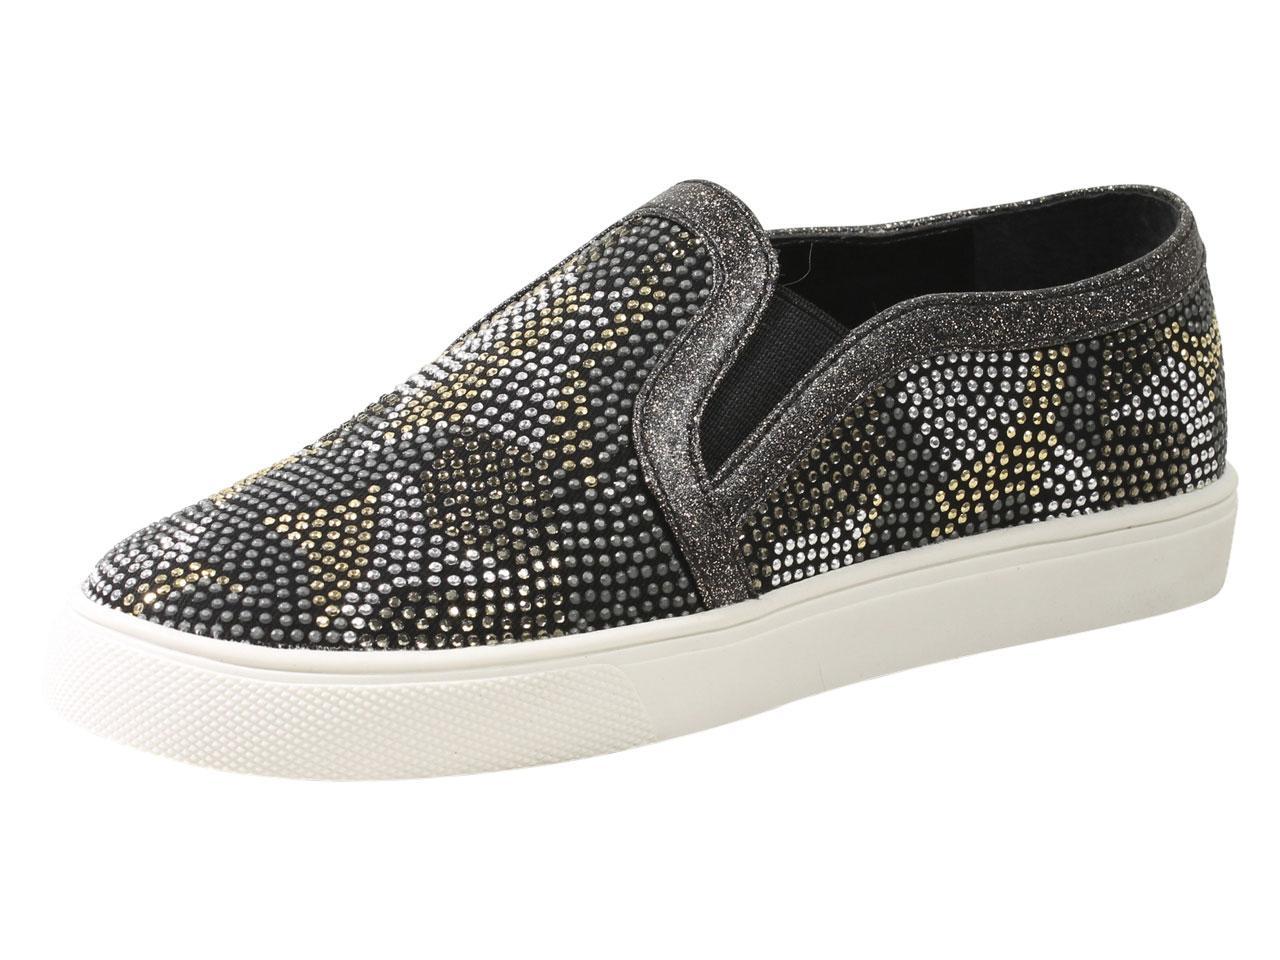 4d12c46e63 Vince Camuto Little/Big Girl's Basha Loafers Shoes | eBay